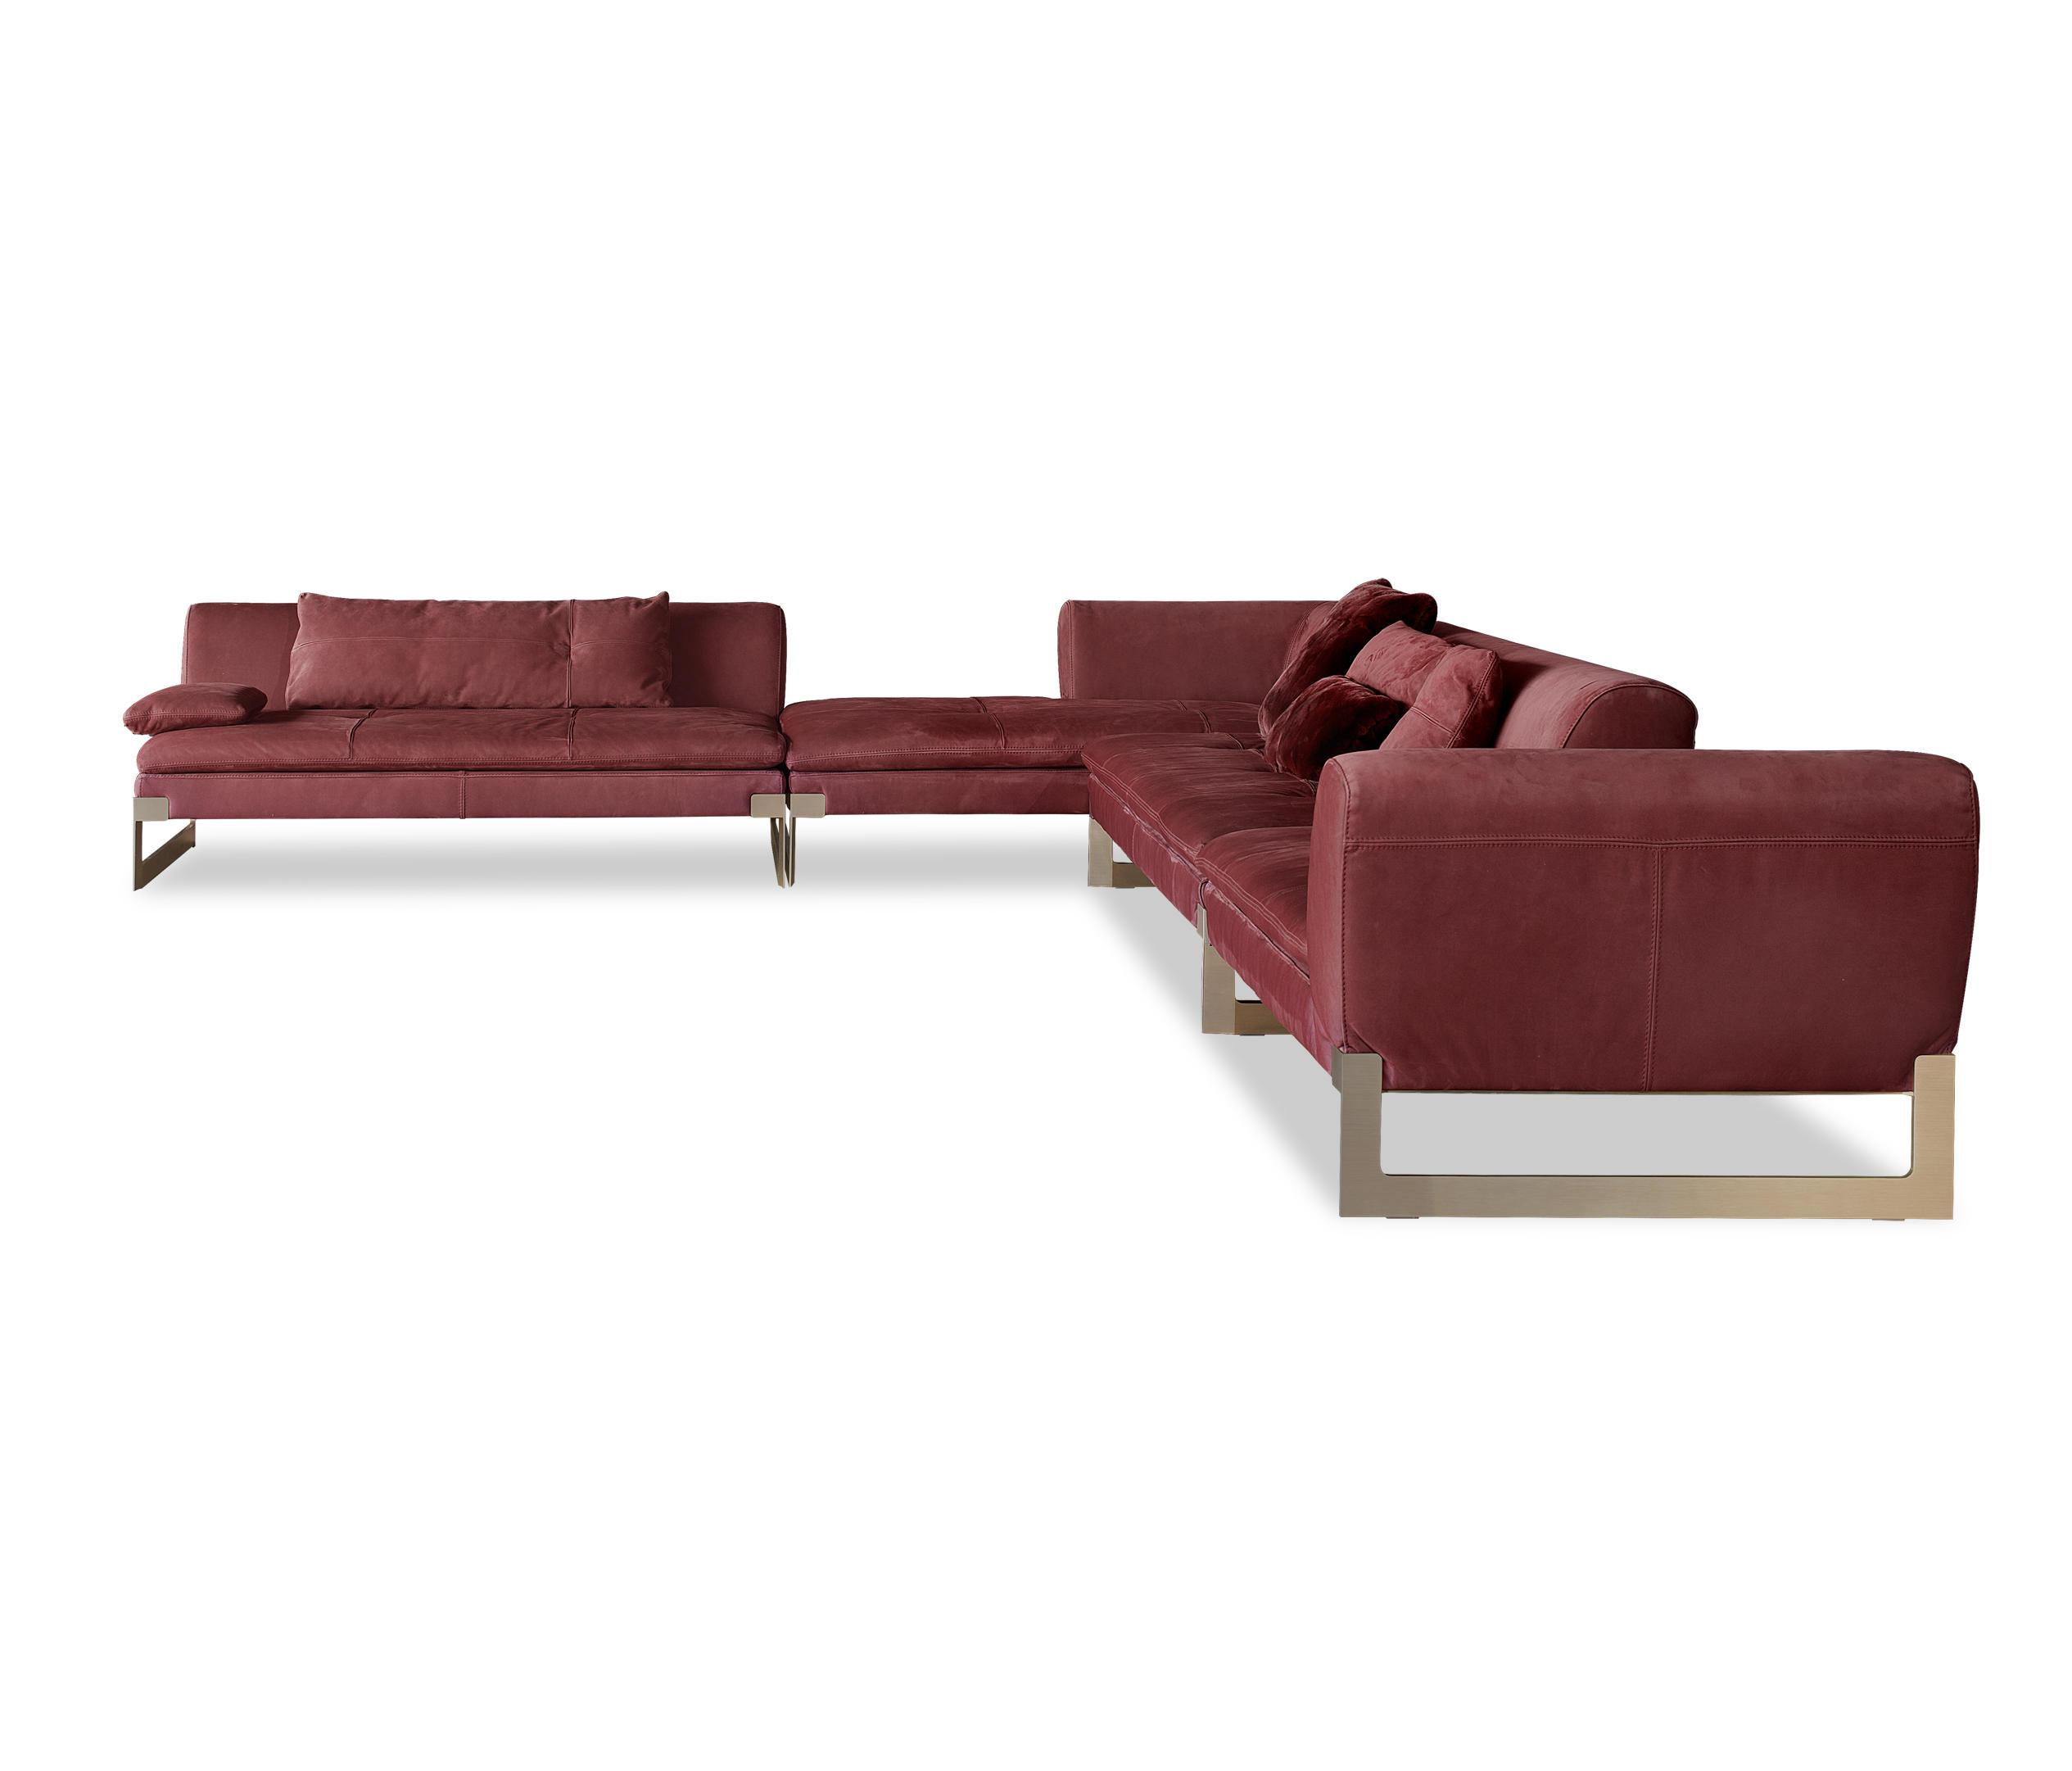 Sofa Blocks Radiator Connect Sofa 2 Seater Sofas From Muuto Architonic Thesofa